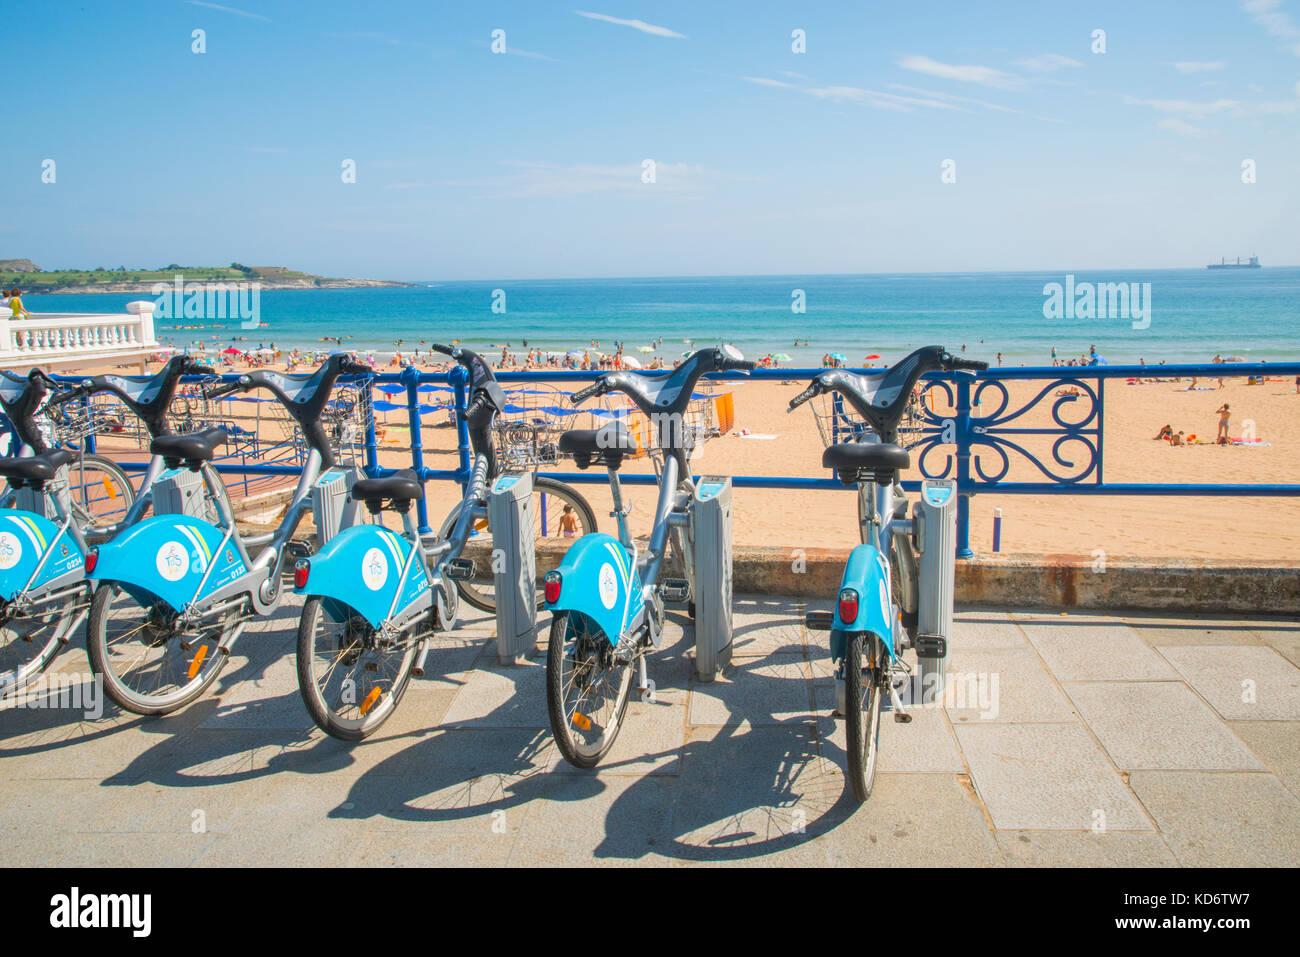 Bike parking and El Sardinero beach. Santander, Spain. - Stock Image